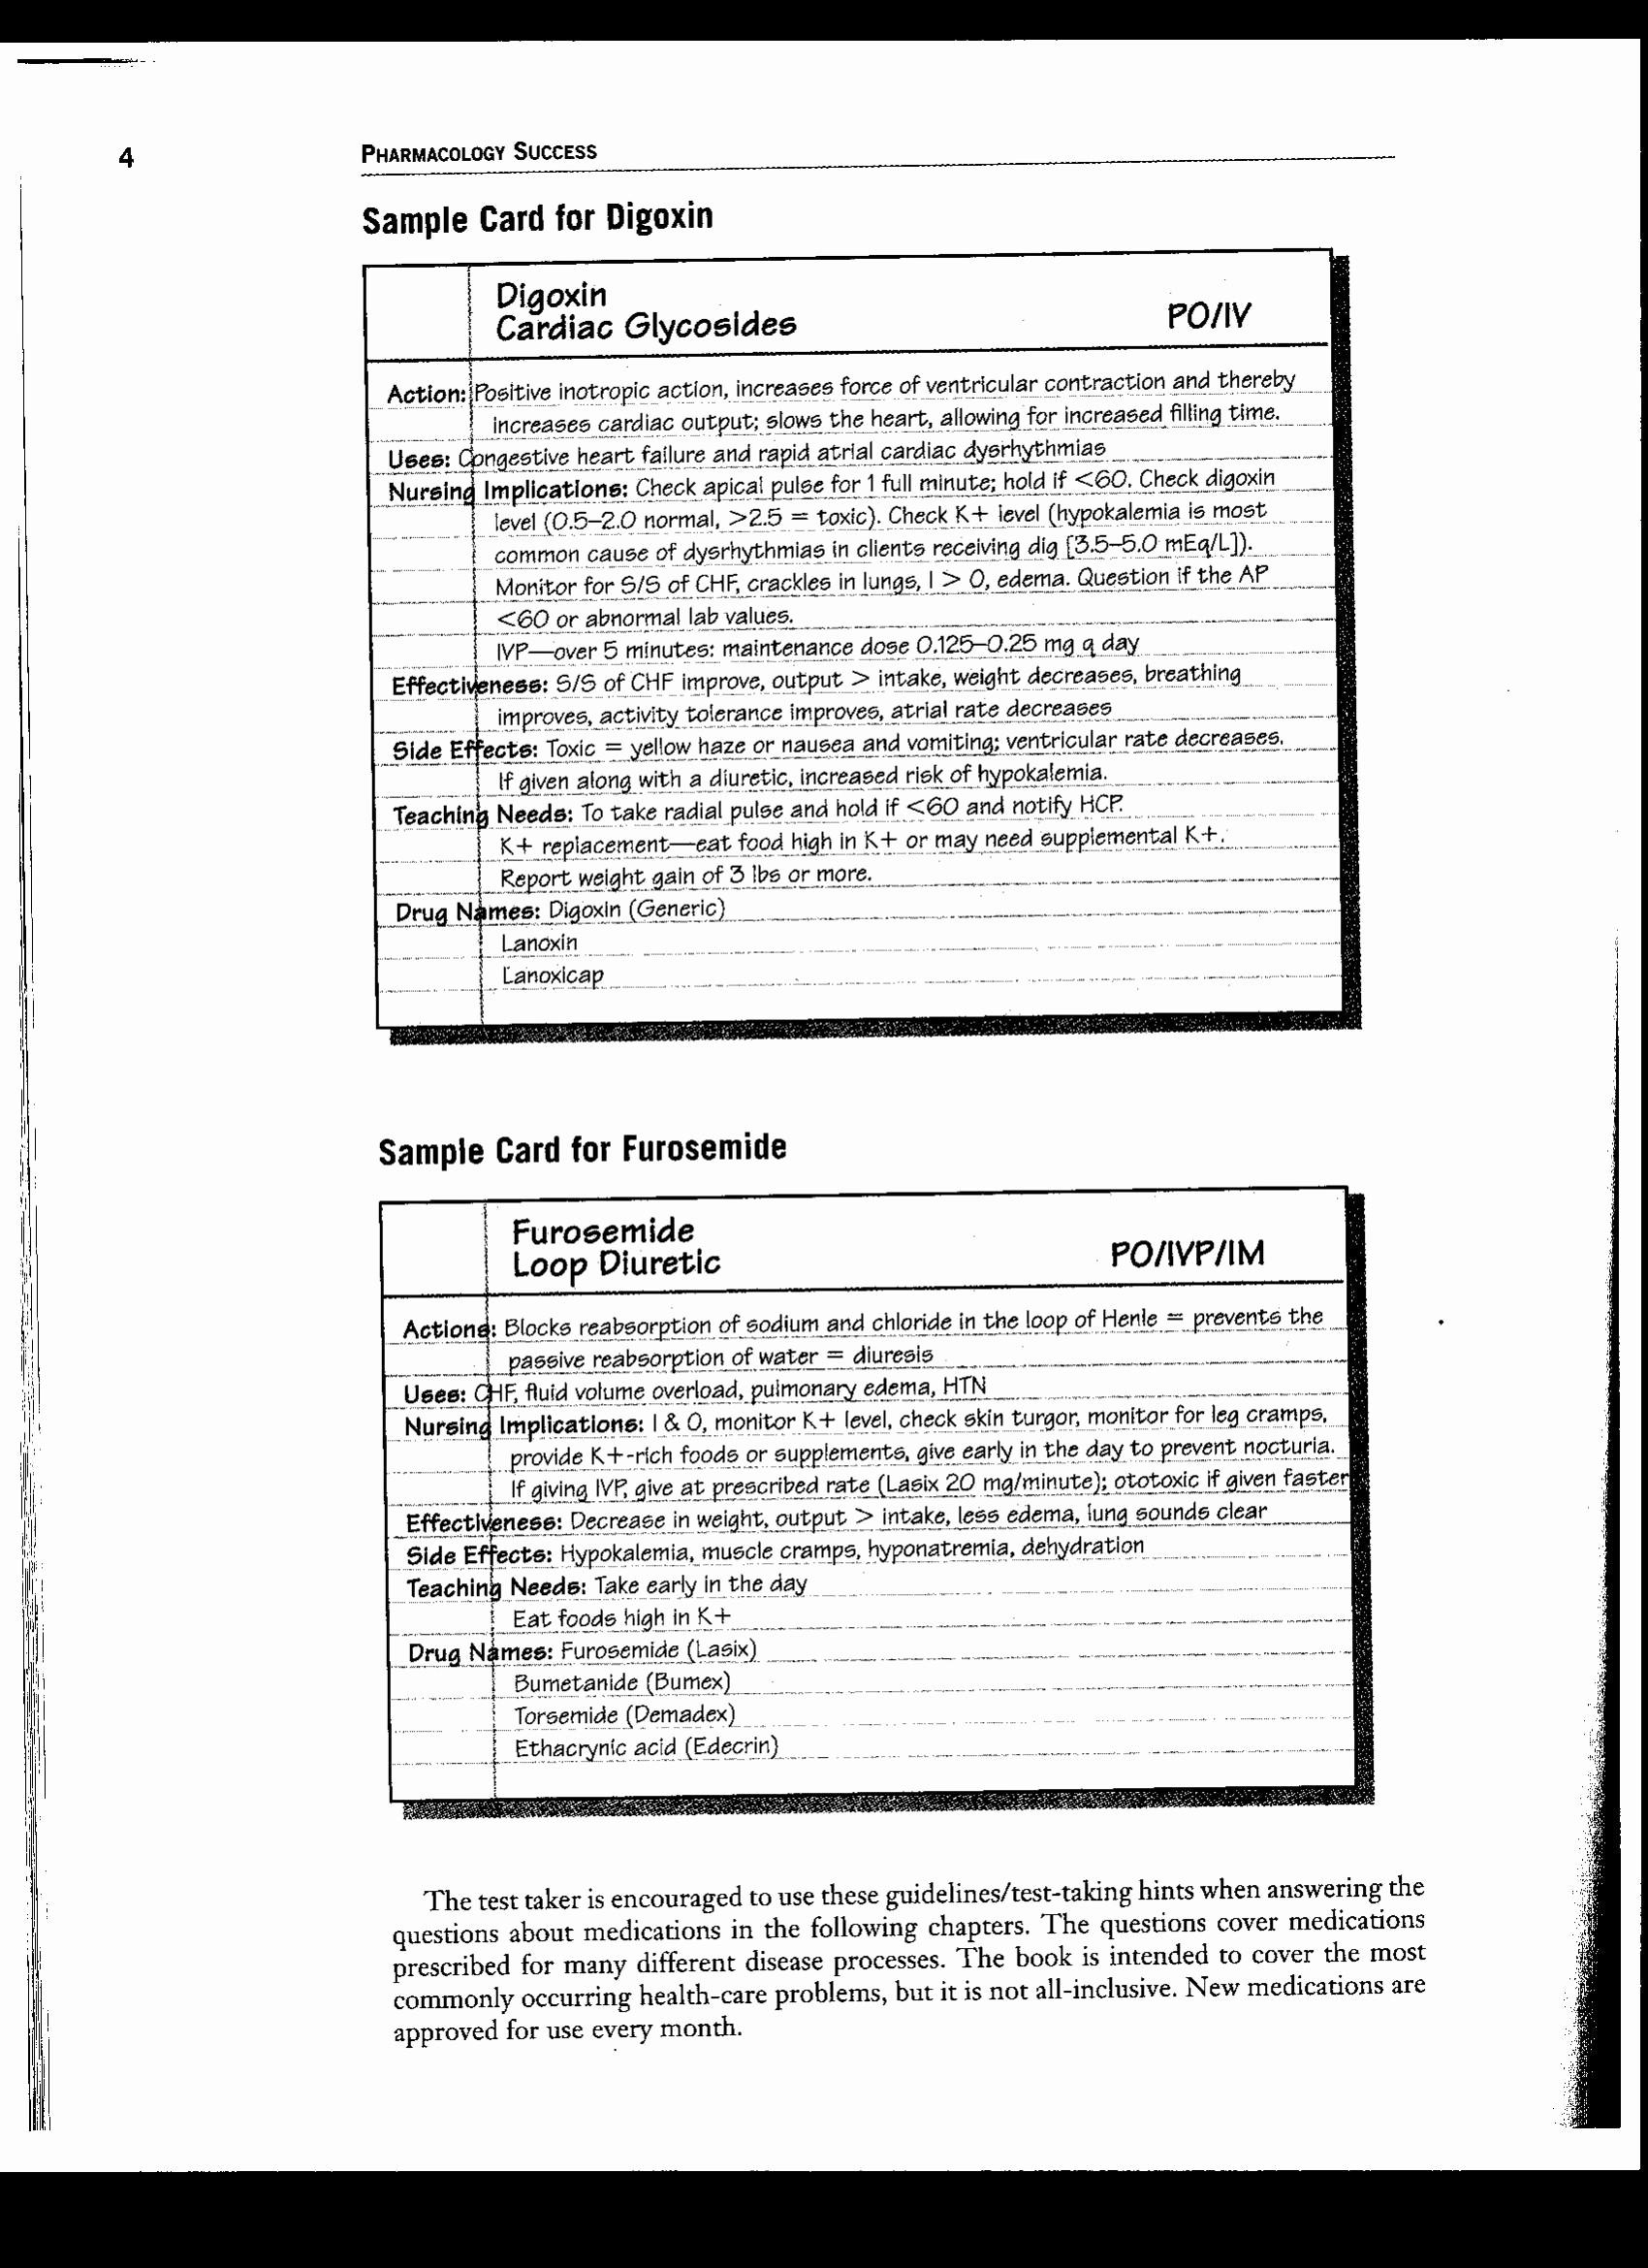 Drug Card Template Microsoft Word Elegant Medication Card Template New General Medical Release form